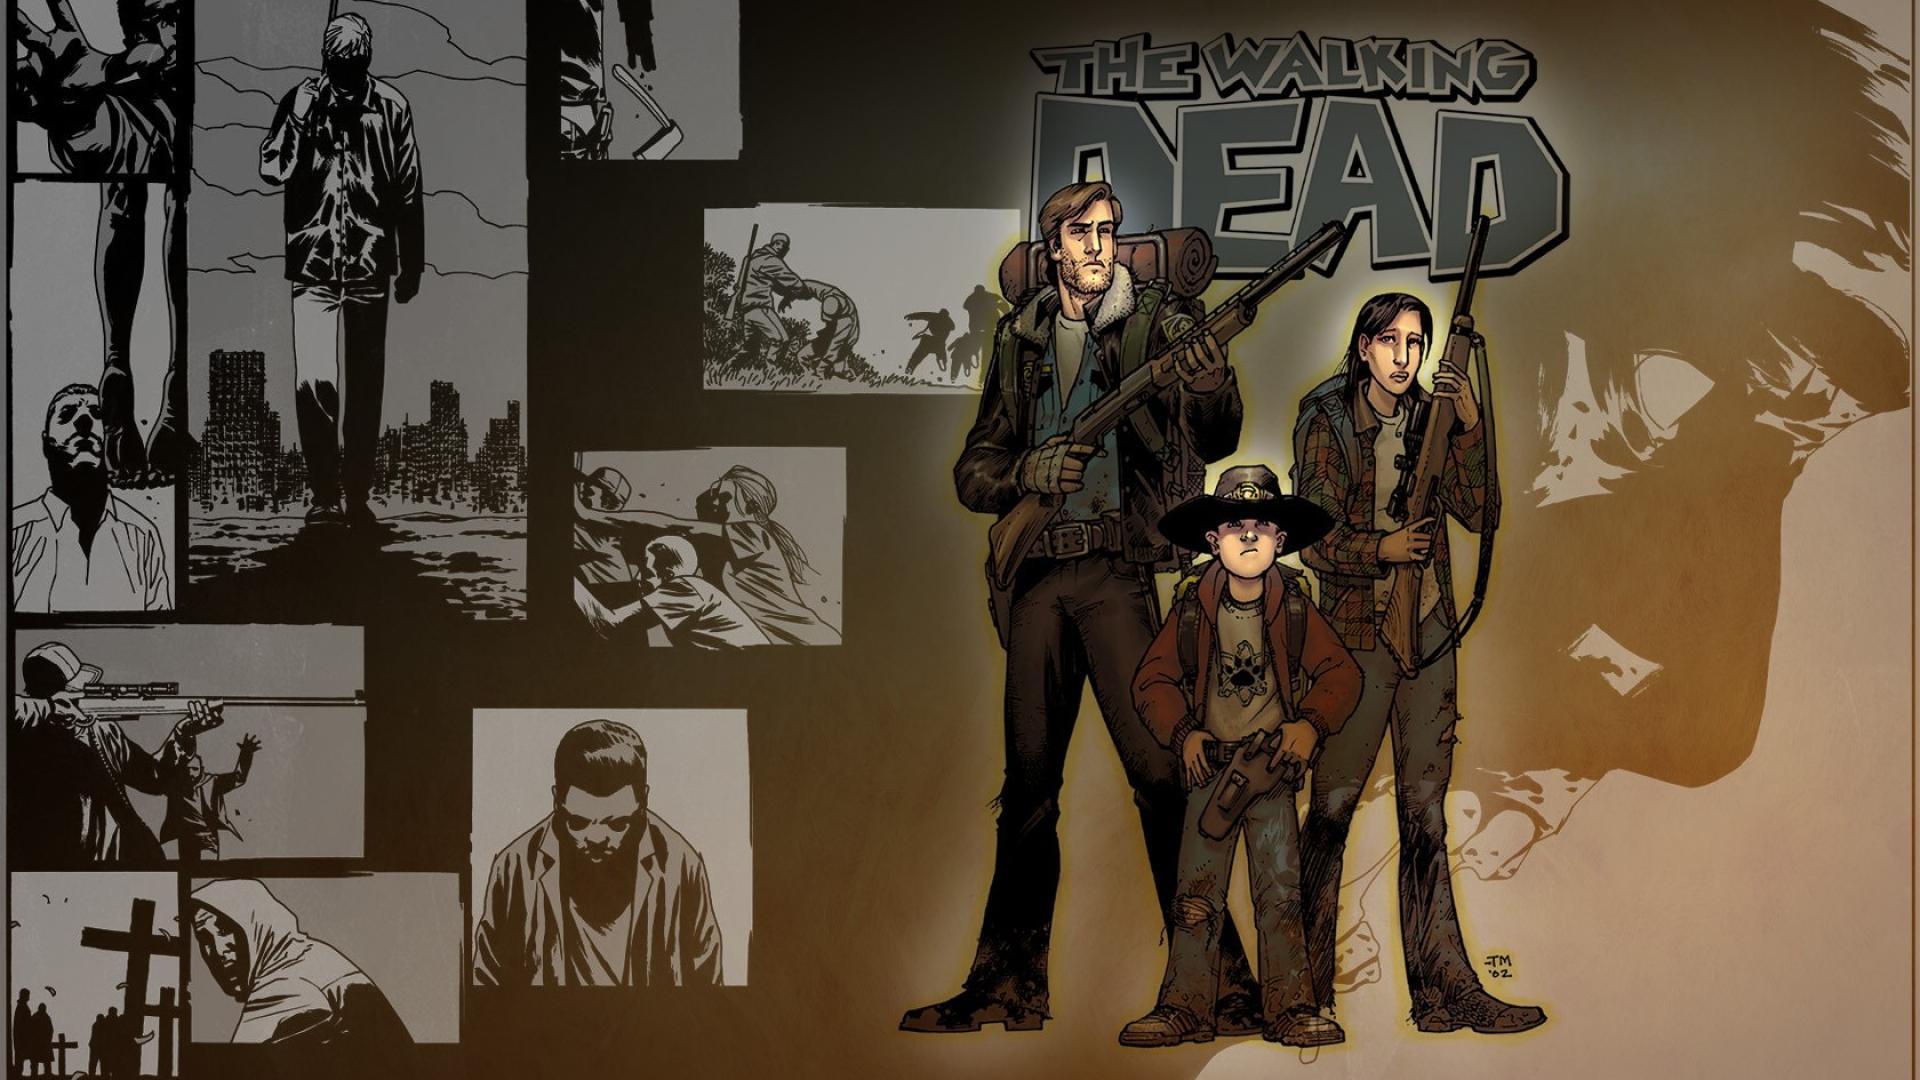 Free Download Comics The Walking Dead Drawings Wallpaper 63461